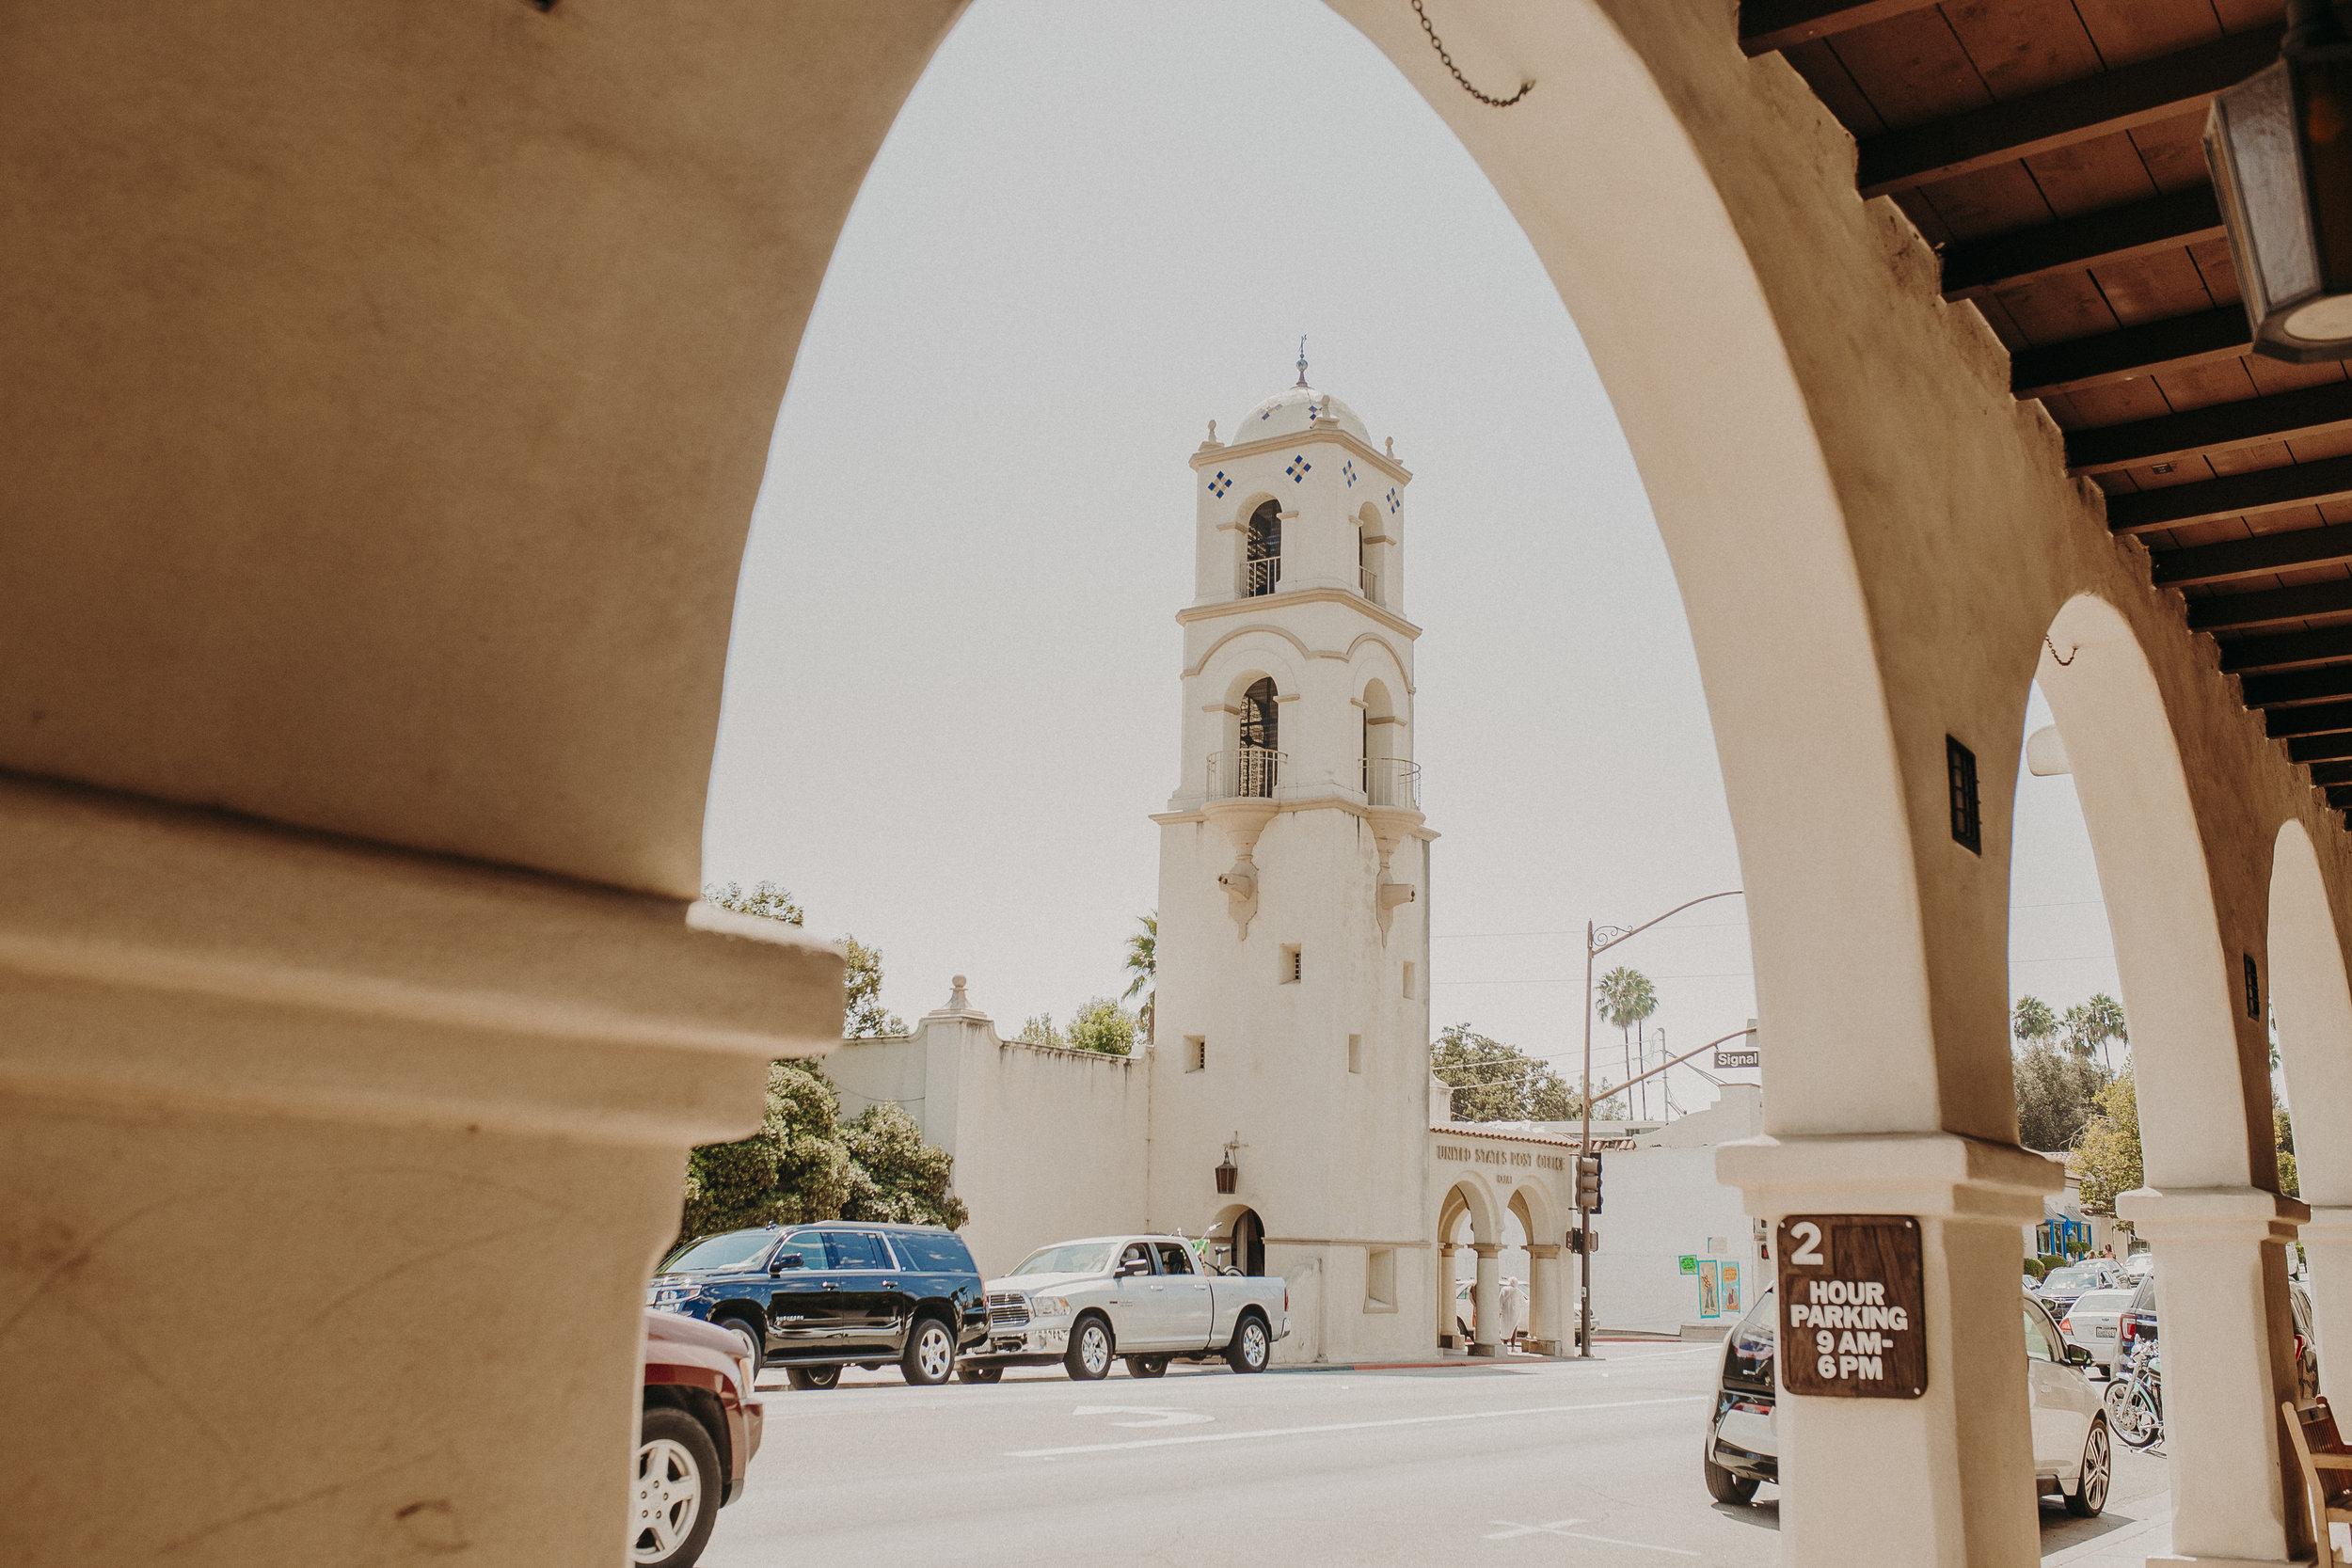 ojai-california-travel-guide-what-to-see-do-eat-8.jpg